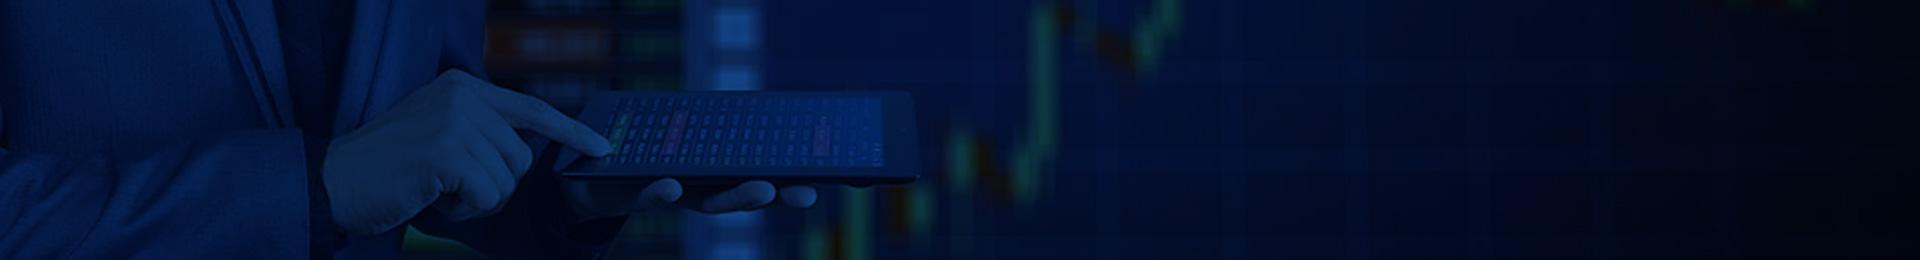 investor-banner